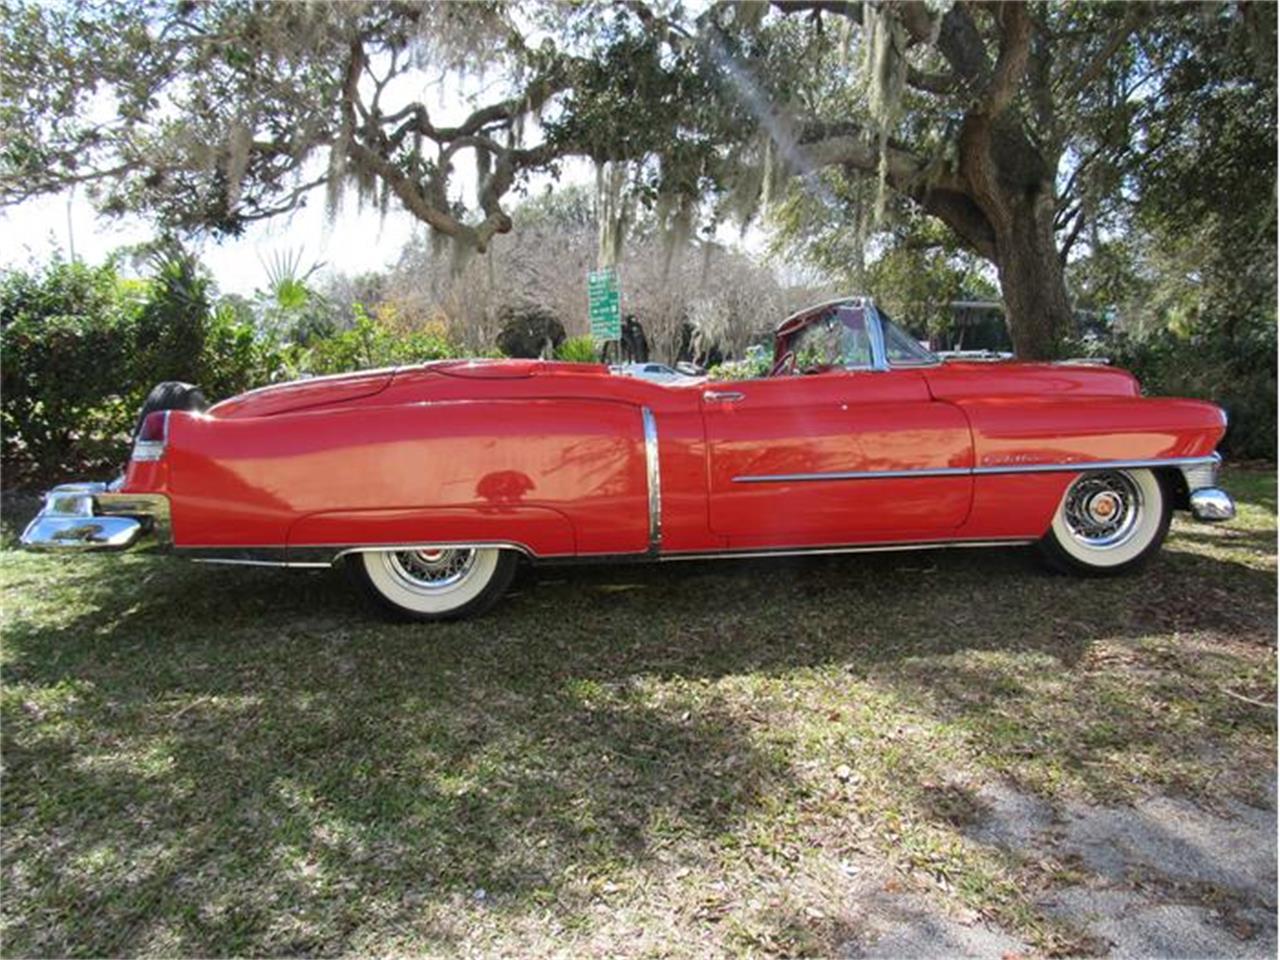 Large Picture of 1953 Eldorado located in Sarasota Florida - $274,500.00 Offered by Vintage Motors Sarasota - GJKK